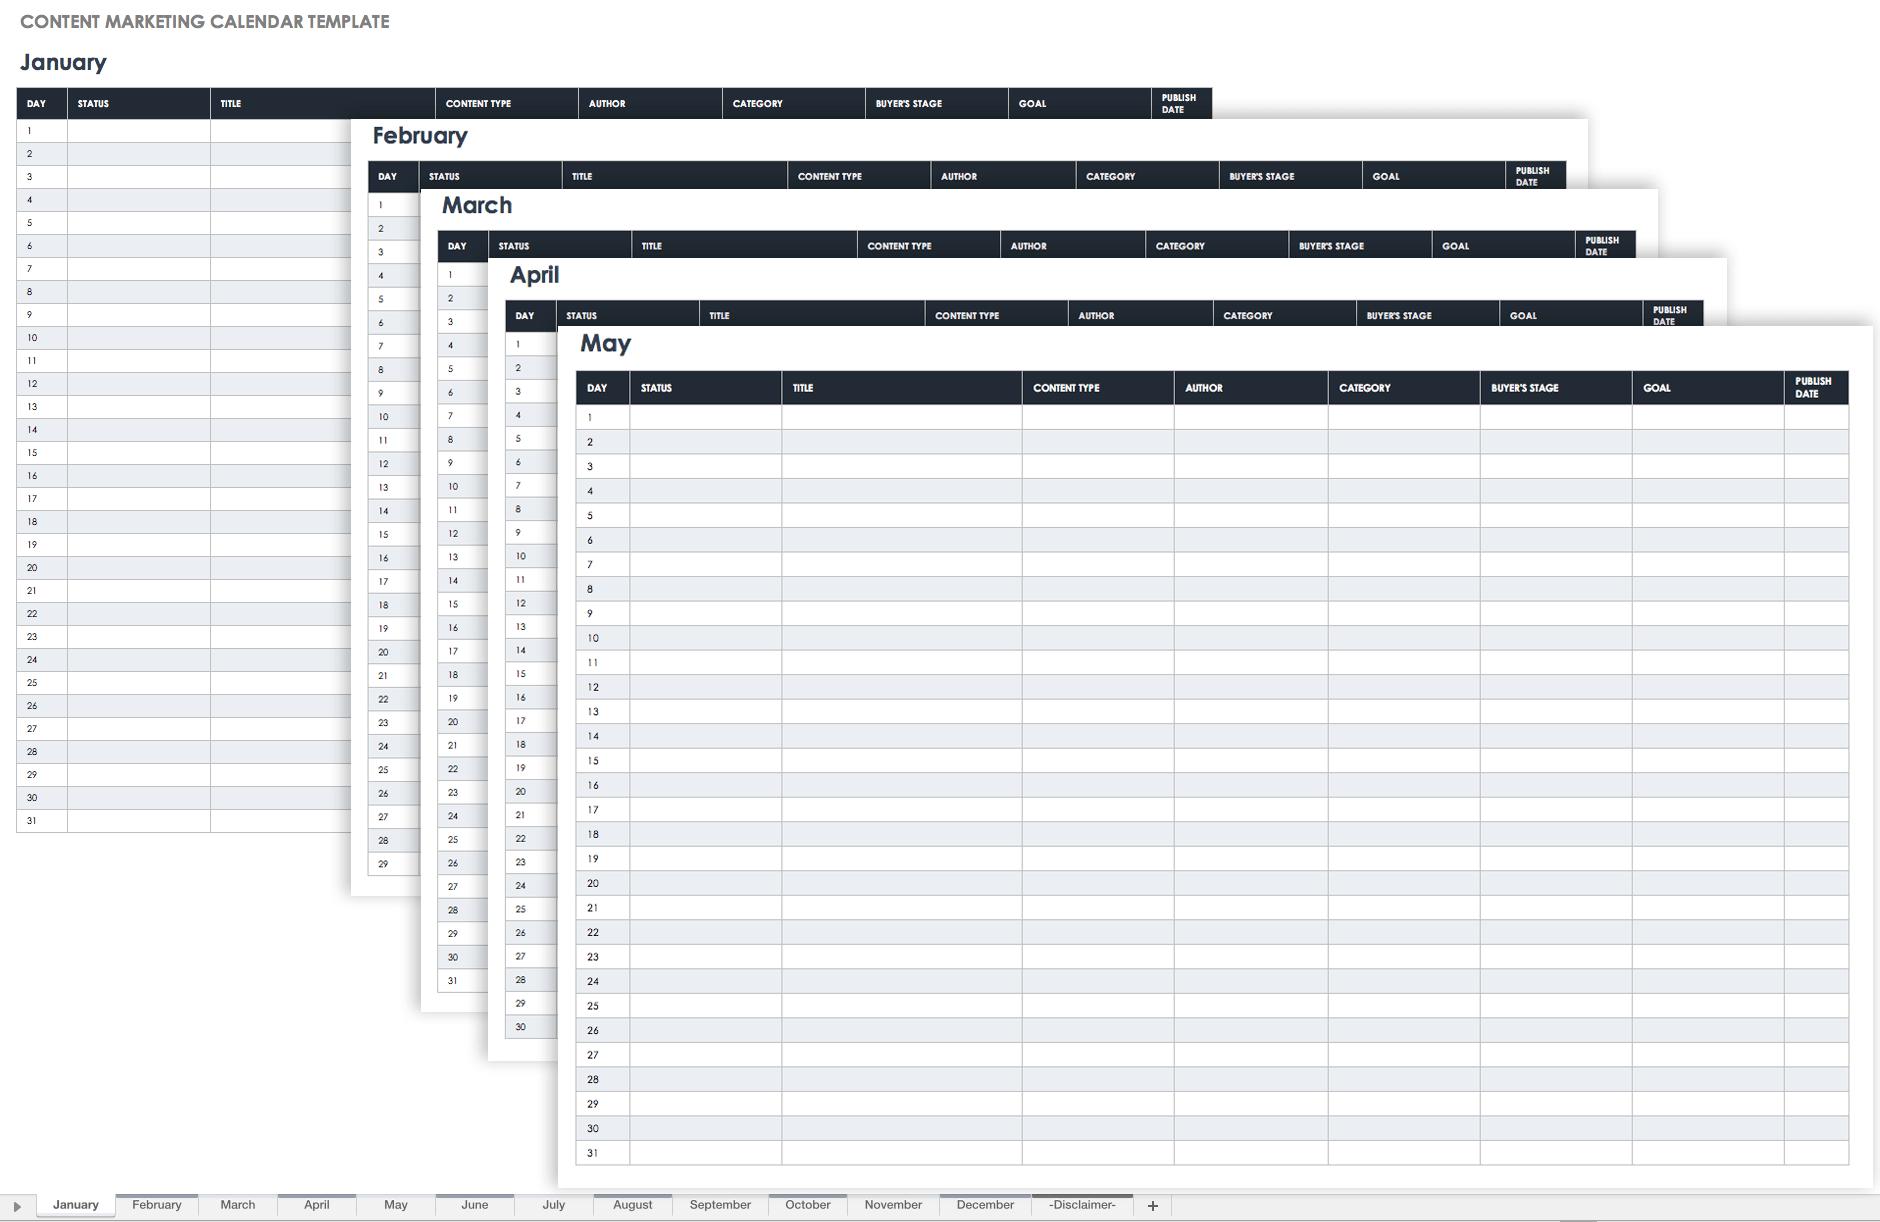 2022 Marketing Calendar.15 Free Marketing Calendar Templates Smartsheet